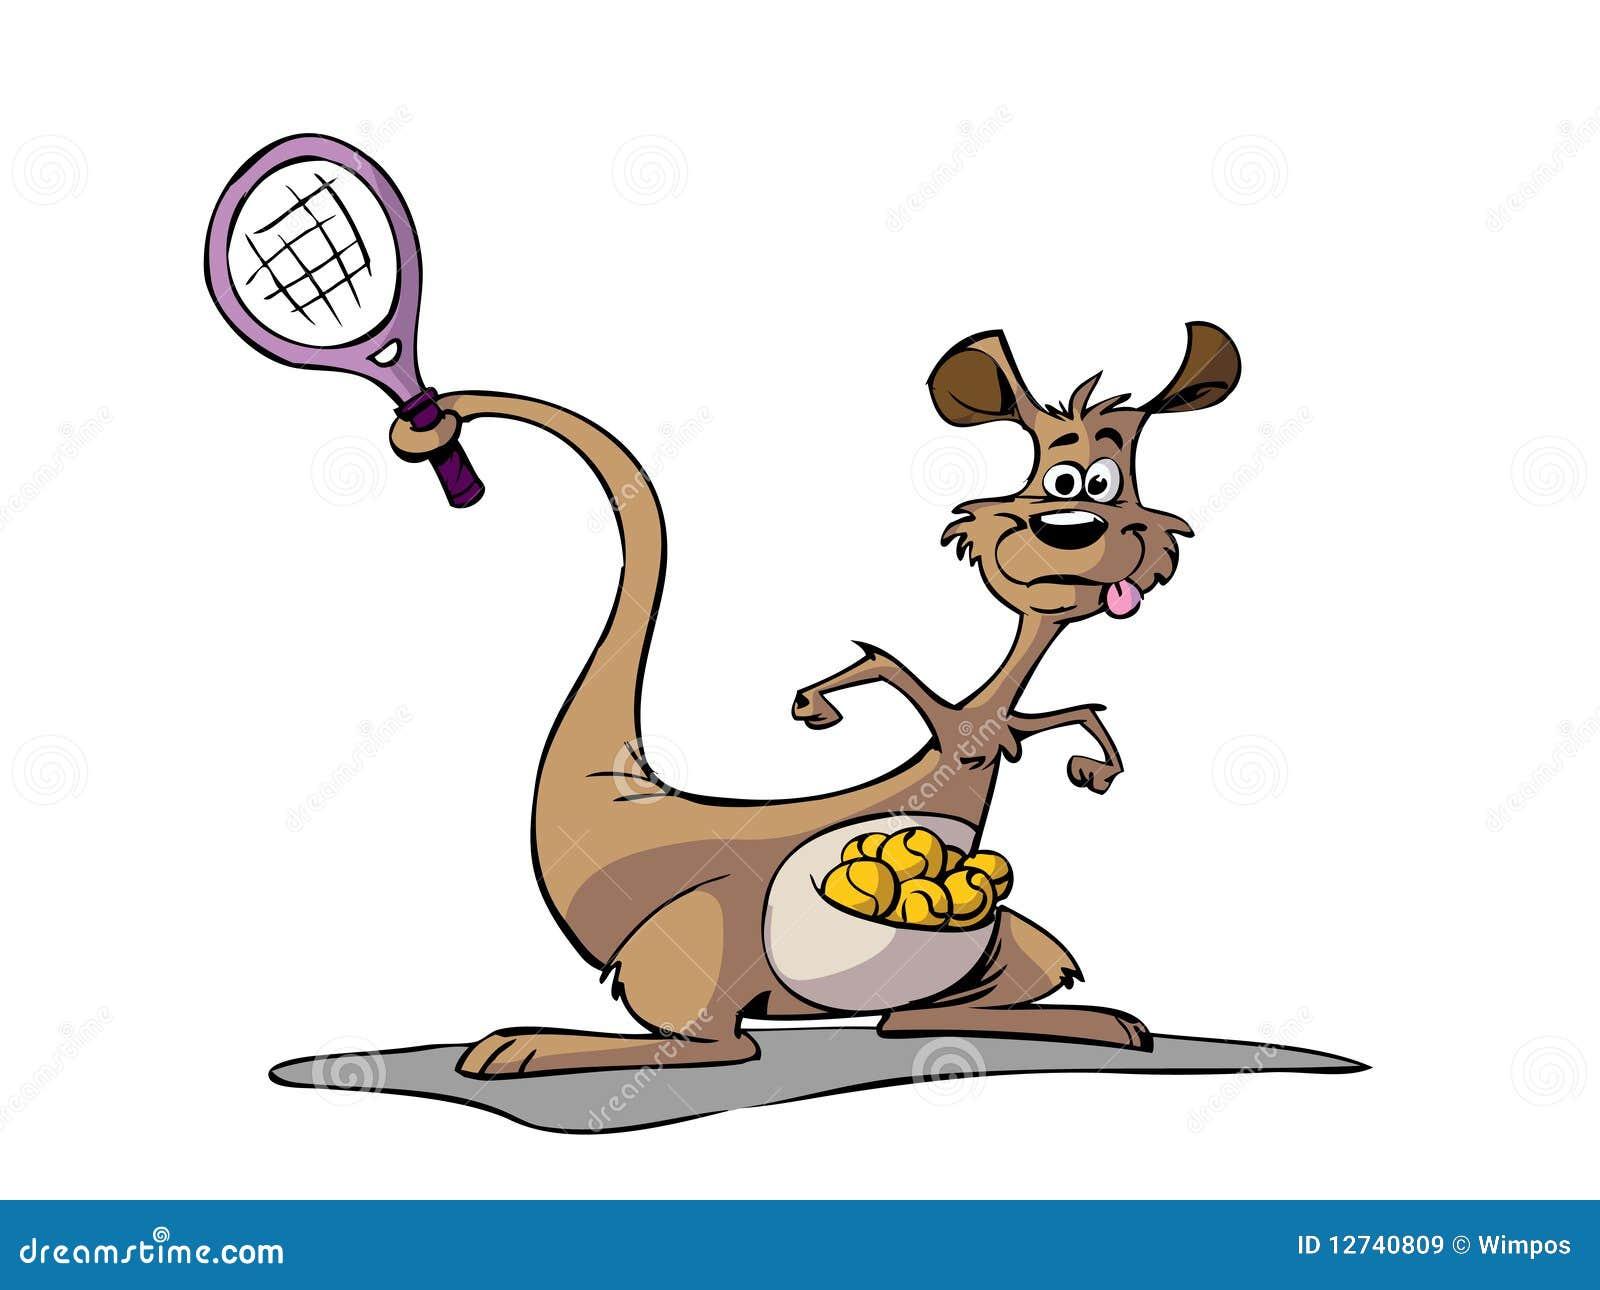 Kangaroo Playing Tennis Stock Illustration Illustration Of Racket